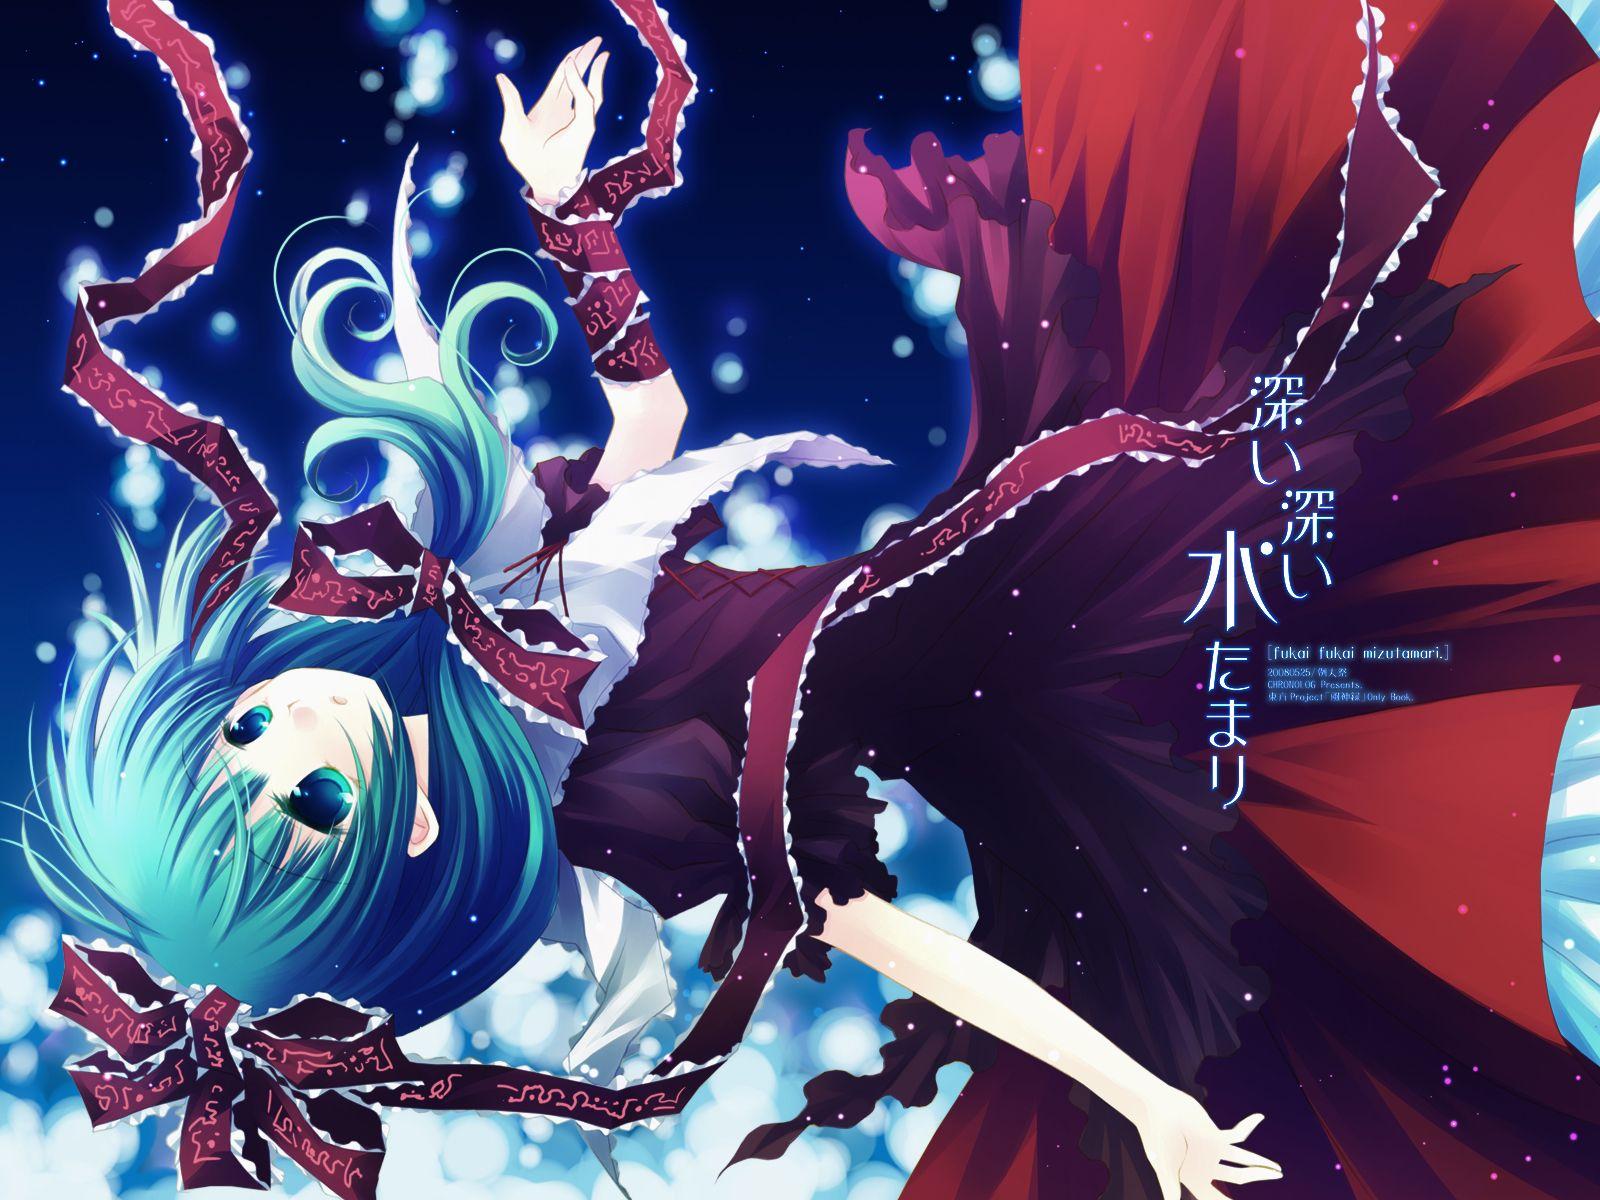 Touhou Anime, Manga girl, Hd ipad wallpapers